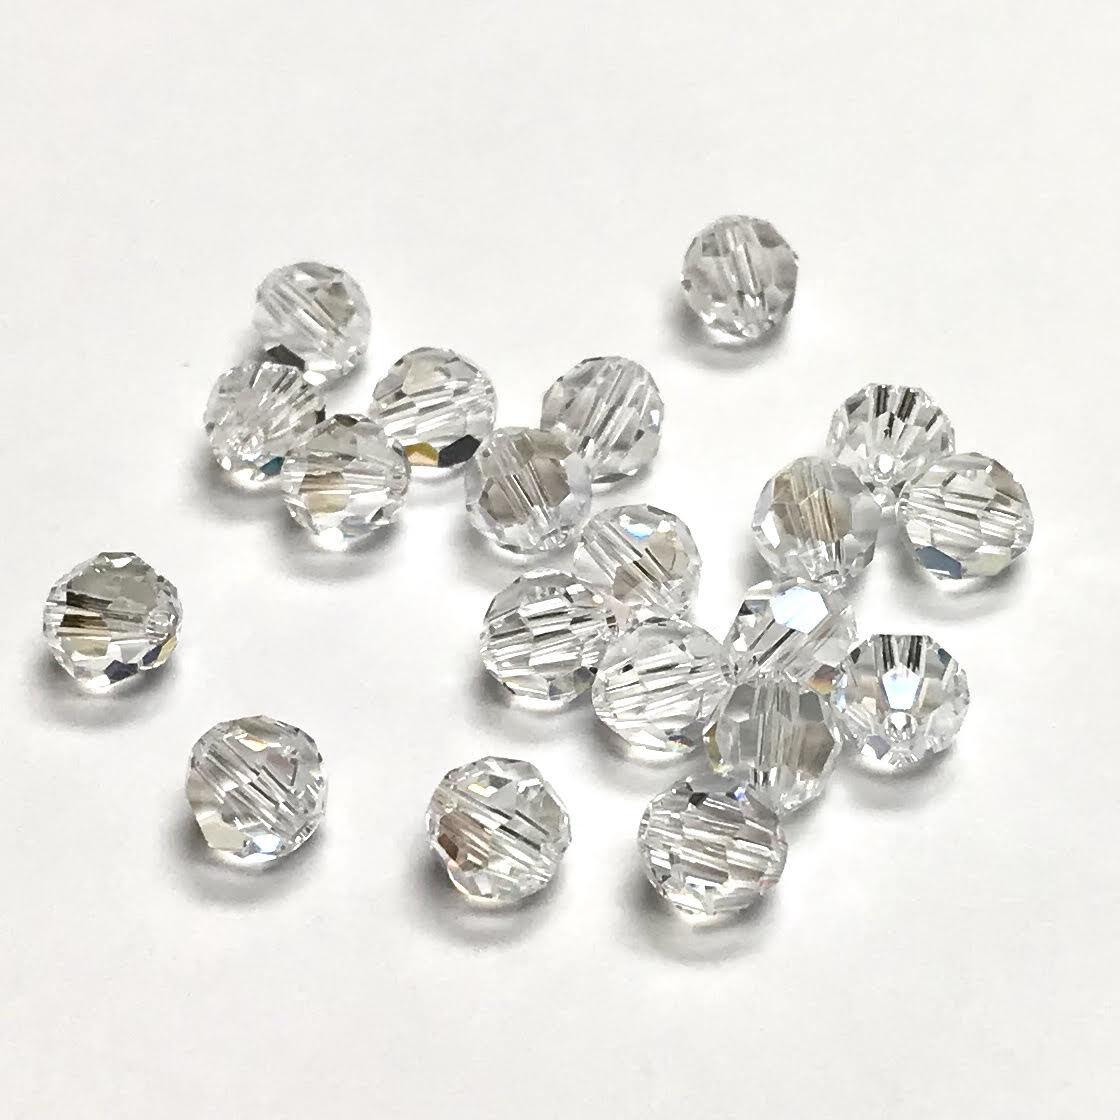 Swarovski Elements, Faceted Round 5000-Crystal, 8mm 1 buc